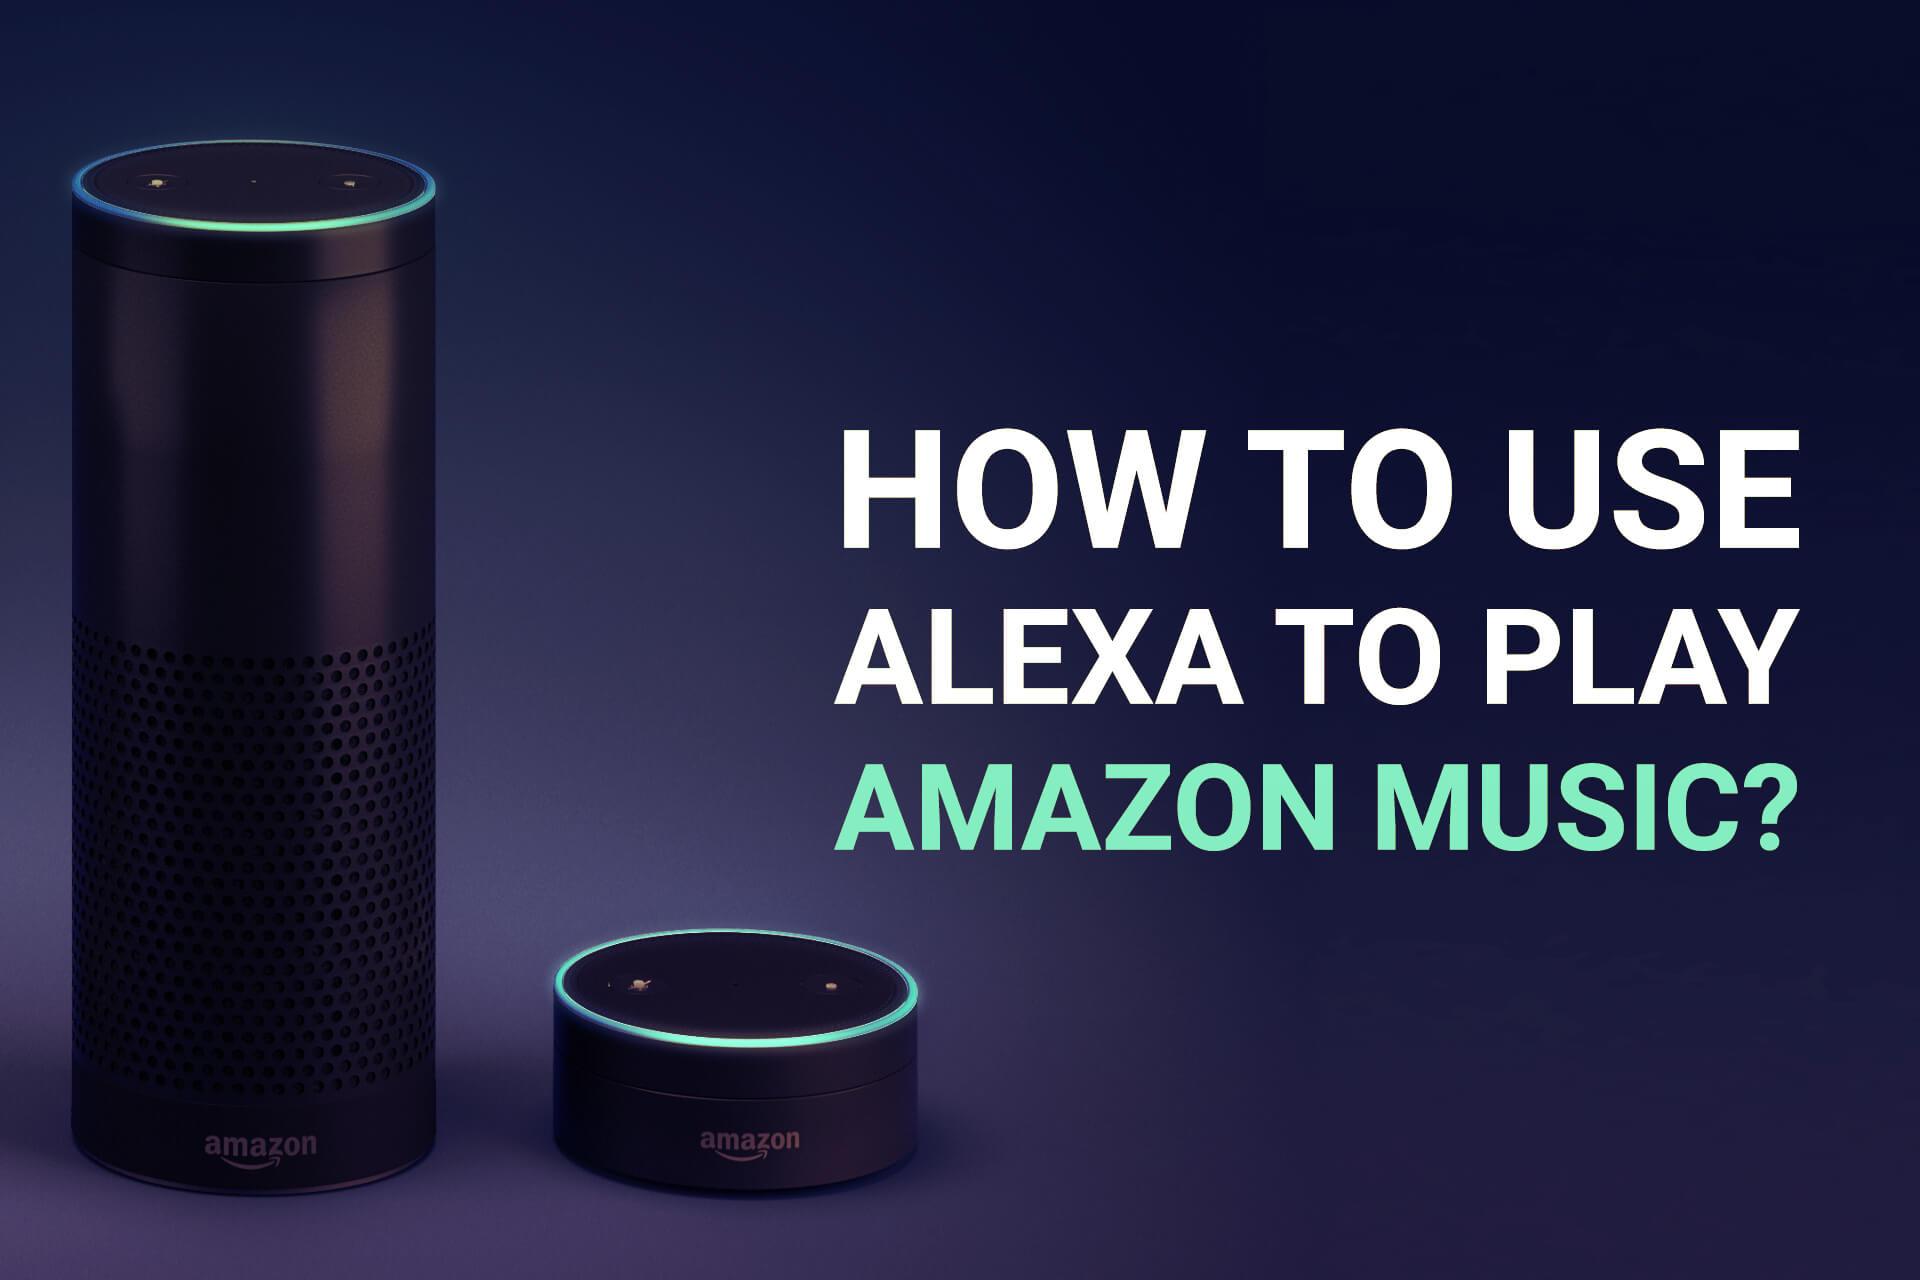 Use_Alexa_To_Play_Amazon_Music